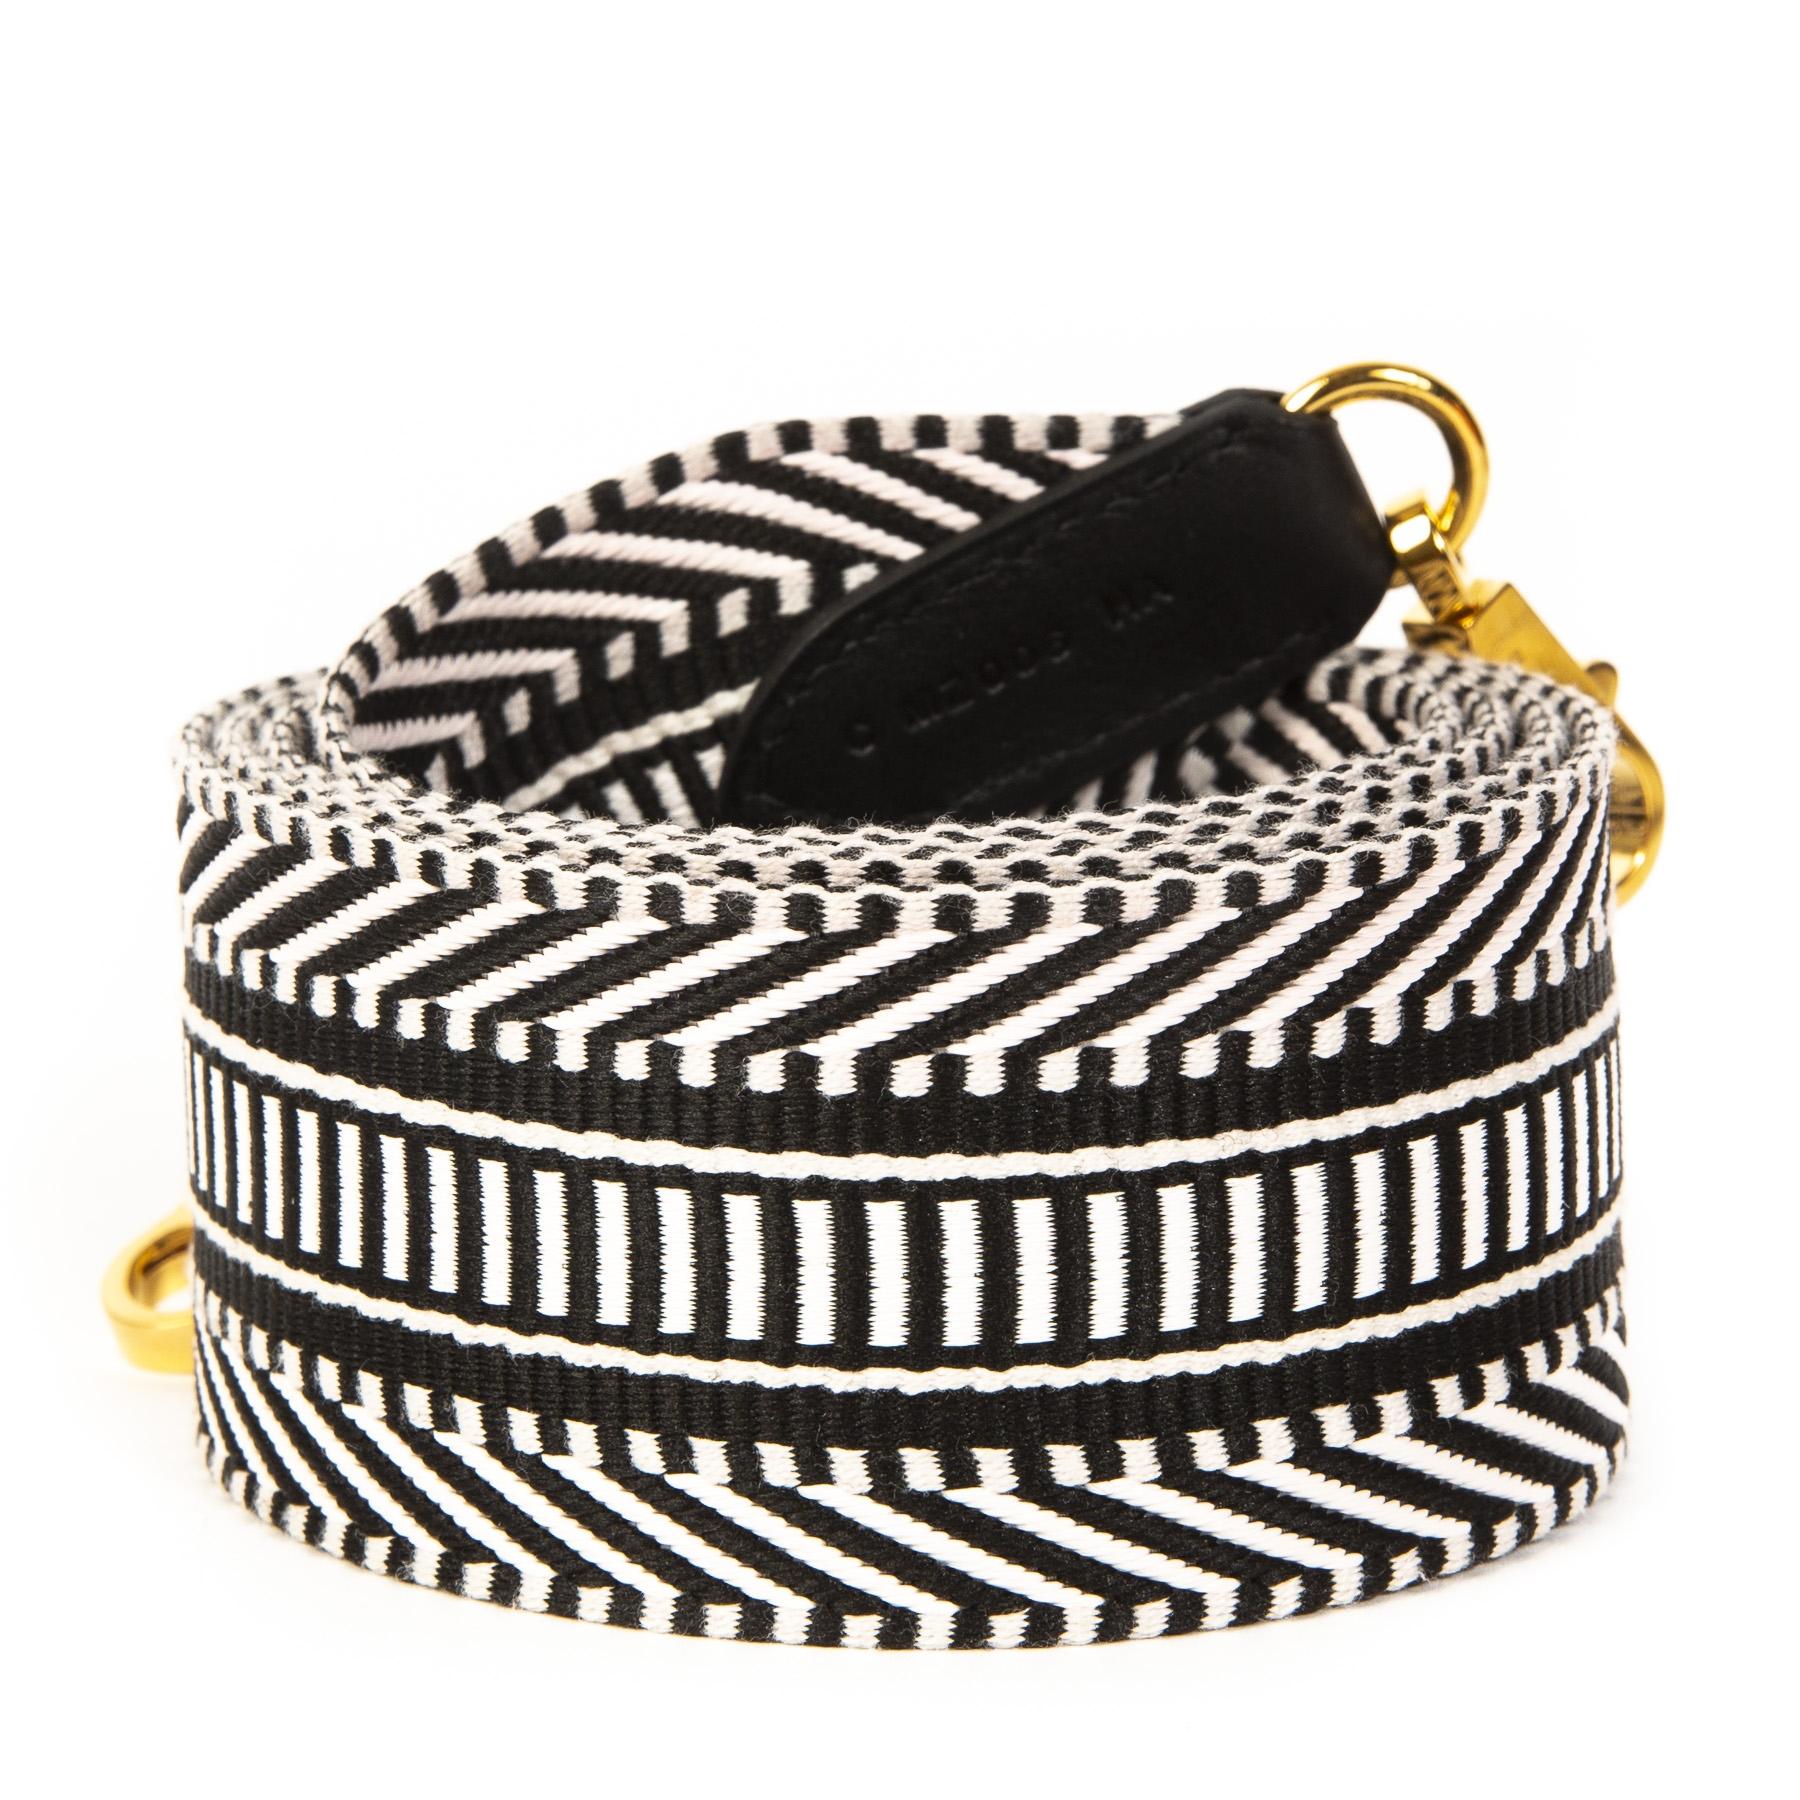 Authentieke Tweedehands Hermès White & Black Bag Strap Sangle Cavale juiste prijs veilig online shoppen luxe merken webshop winkelen Antwerpen België mode fashion